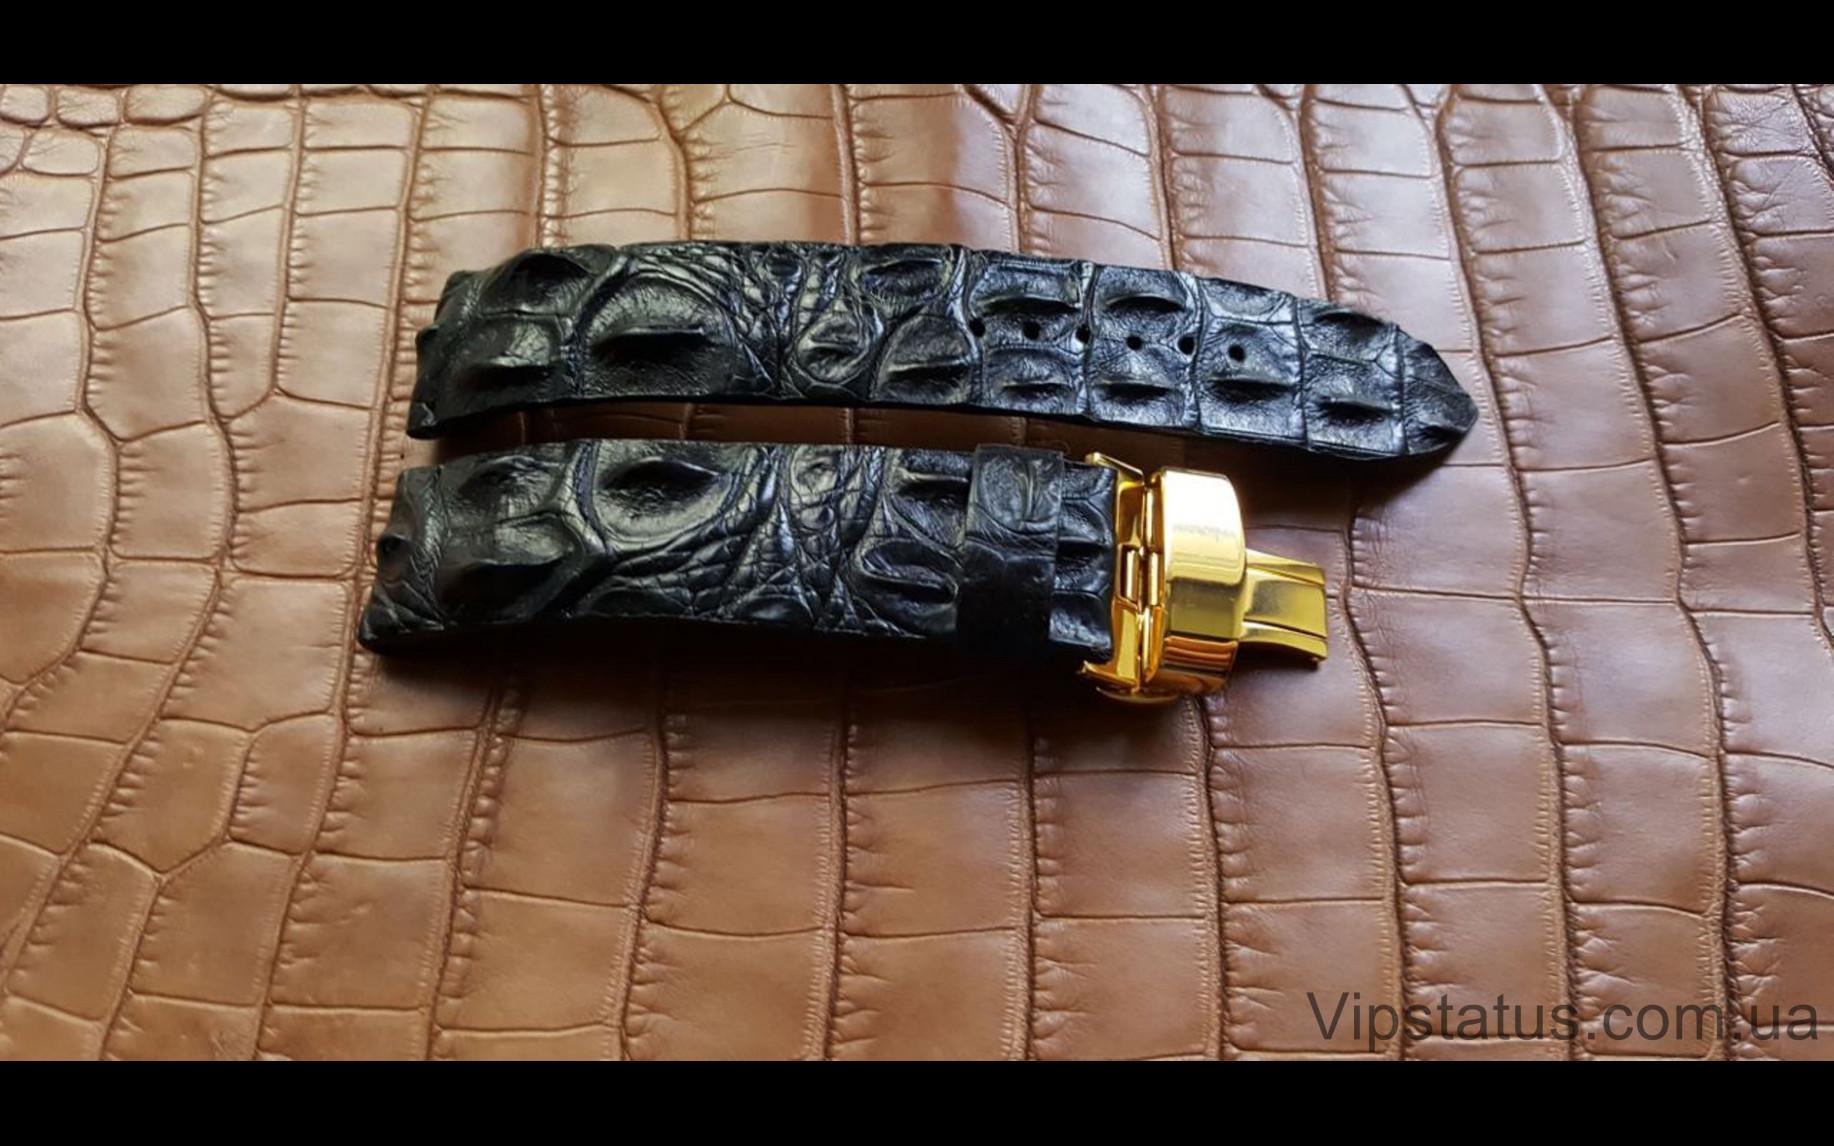 Elite Эксклюзивный ремешок для часов Carl F. Bucherer кожа крокодила Exclusive Crocodile Strap for Carl F. Bucherer watches image 1